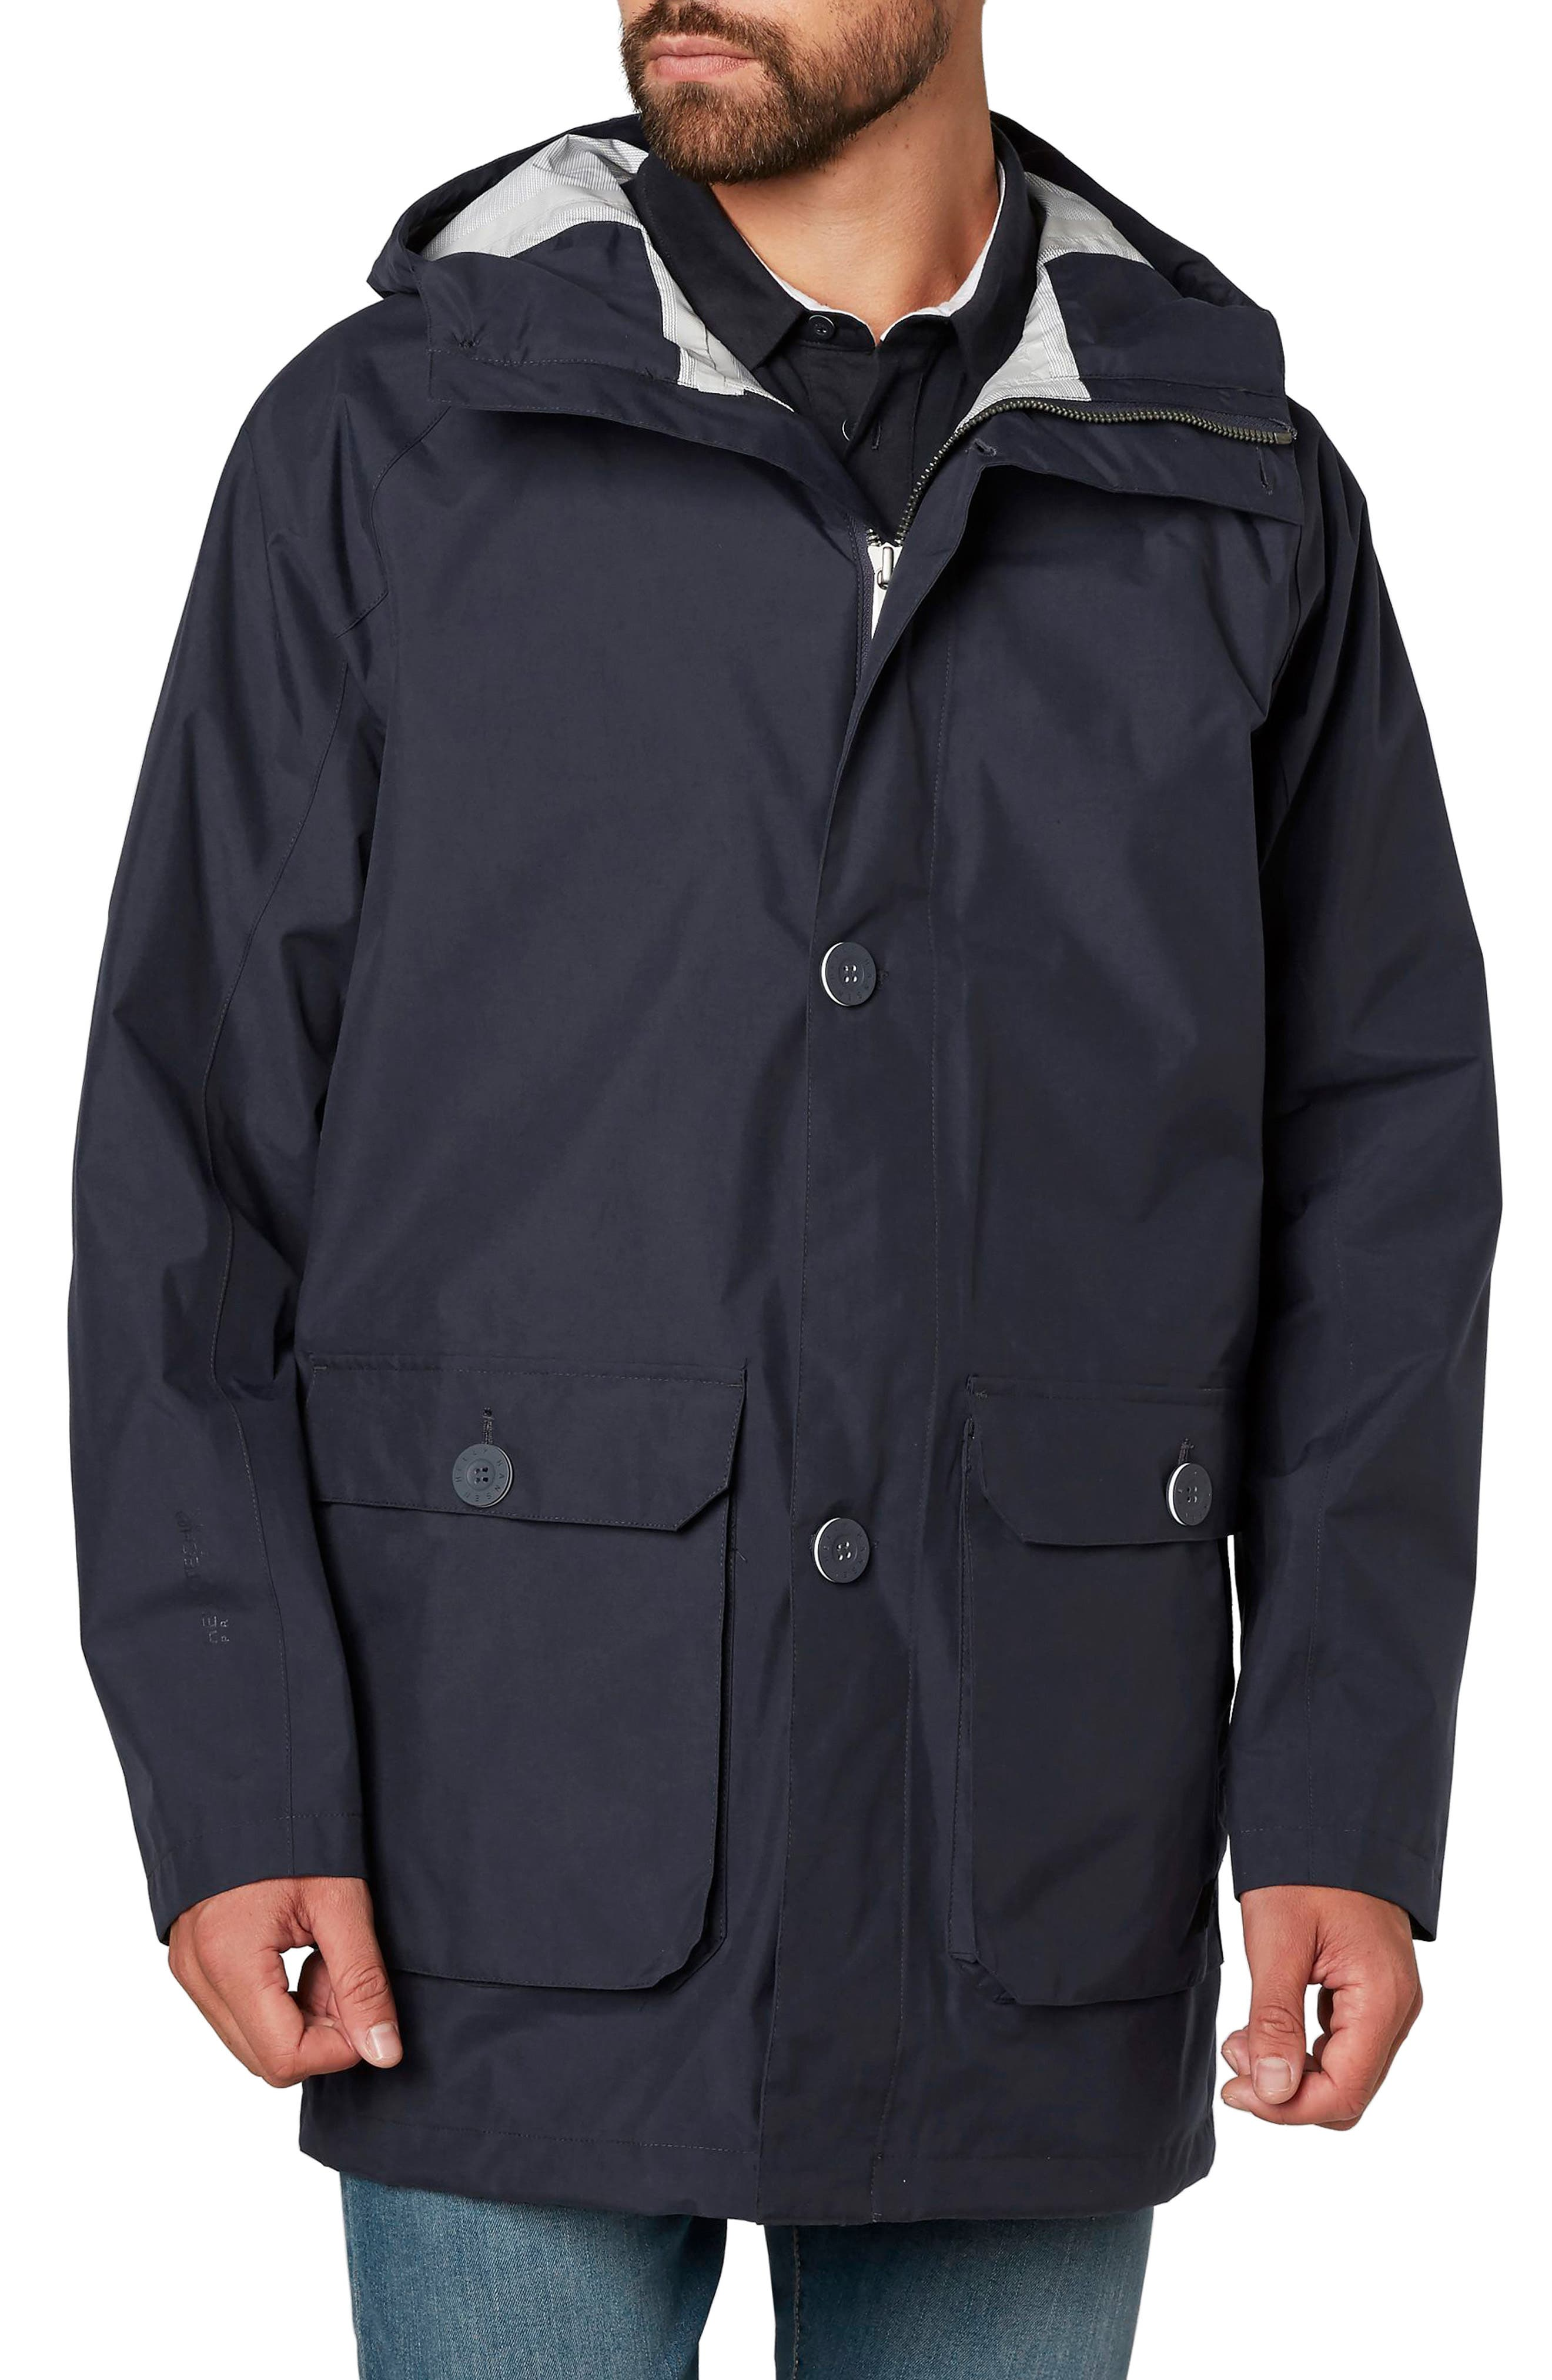 Elements Hooded Rain Jacket,                             Main thumbnail 1, color,                             Graphite Blue